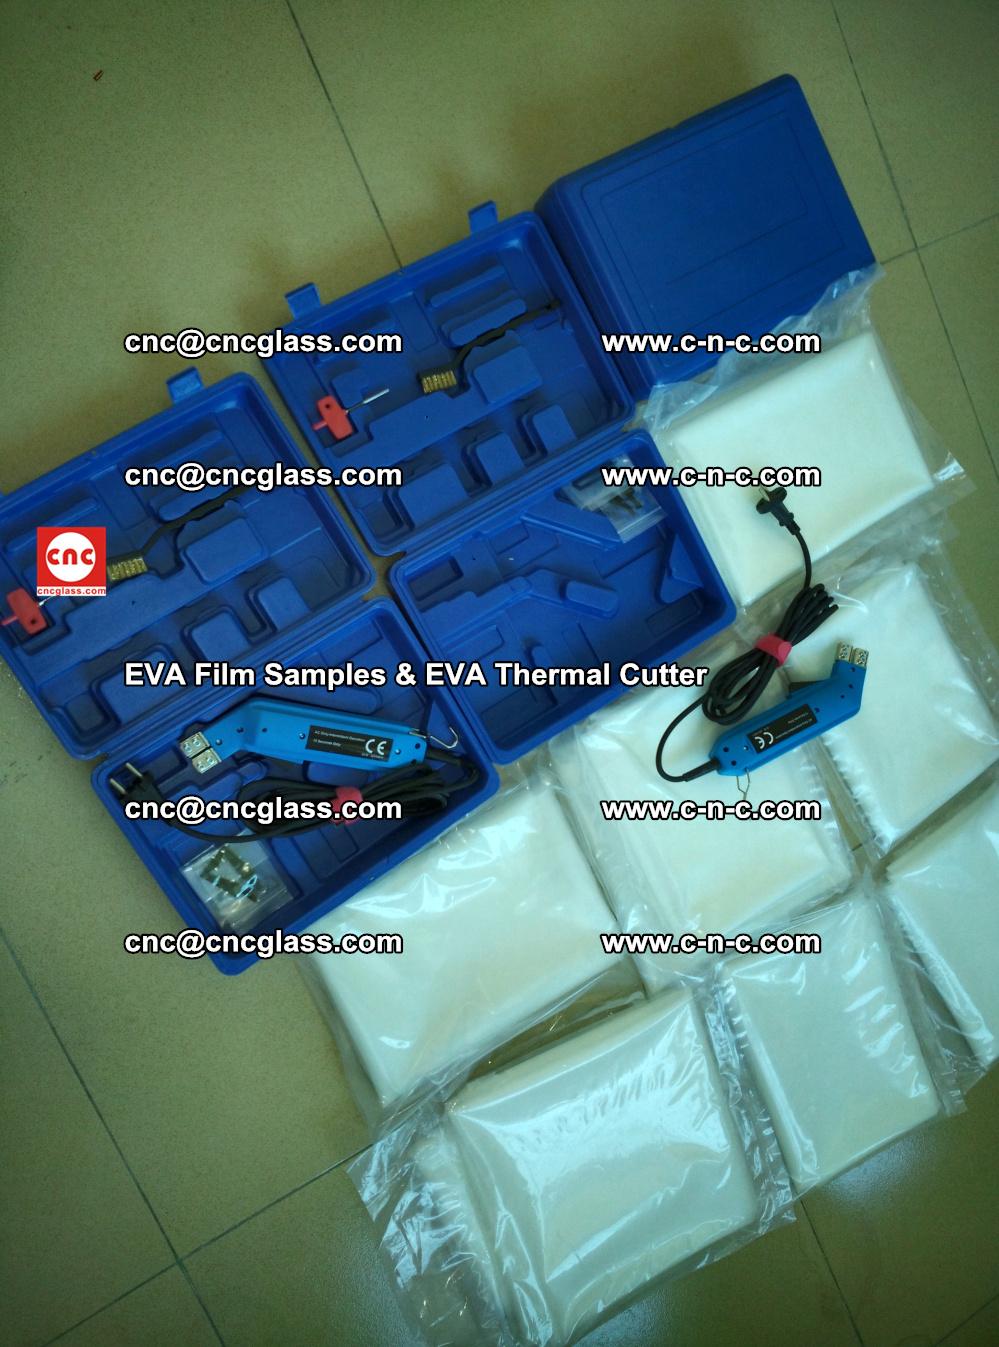 EVAFORCE SUPER CLEAR EVA Film Samples and EVA Thermal Cutter (16)